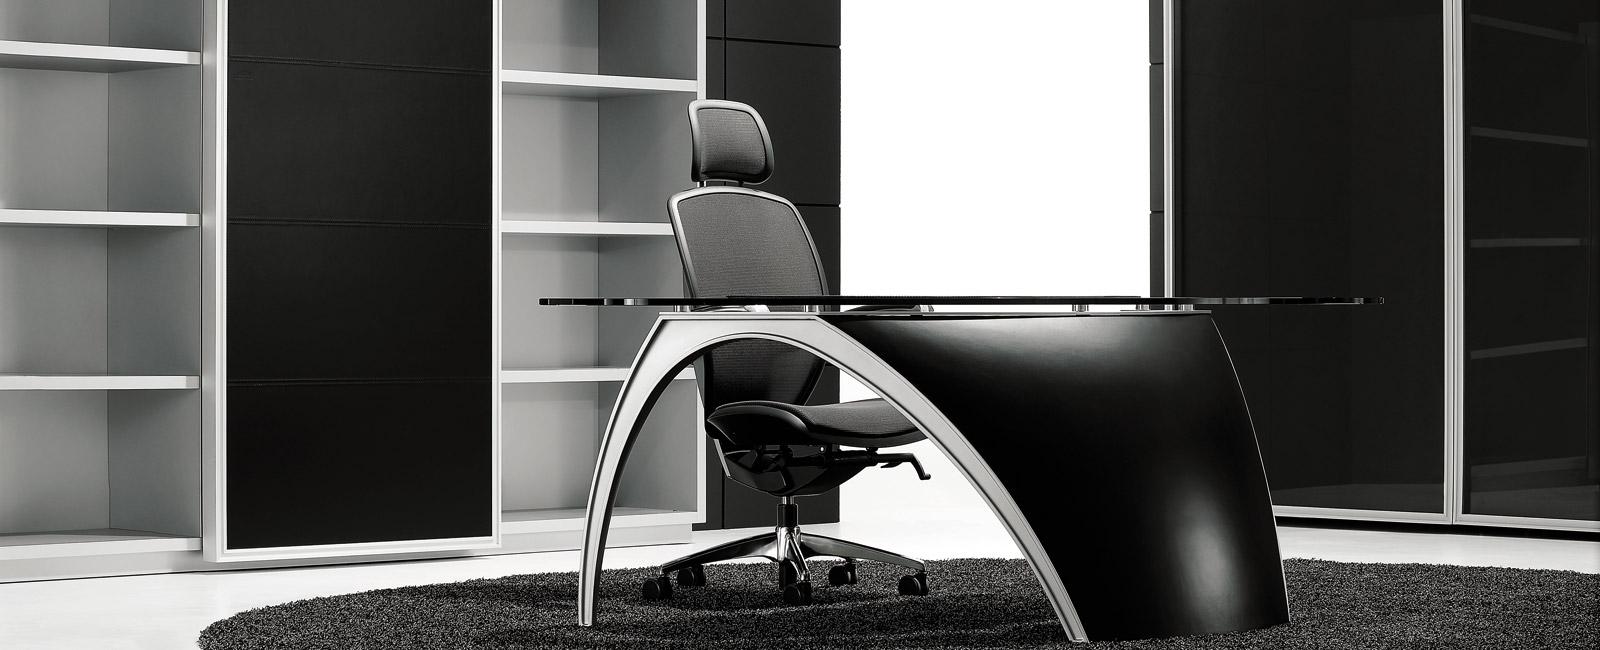 luna aux docks du bureau buro espace. Black Bedroom Furniture Sets. Home Design Ideas